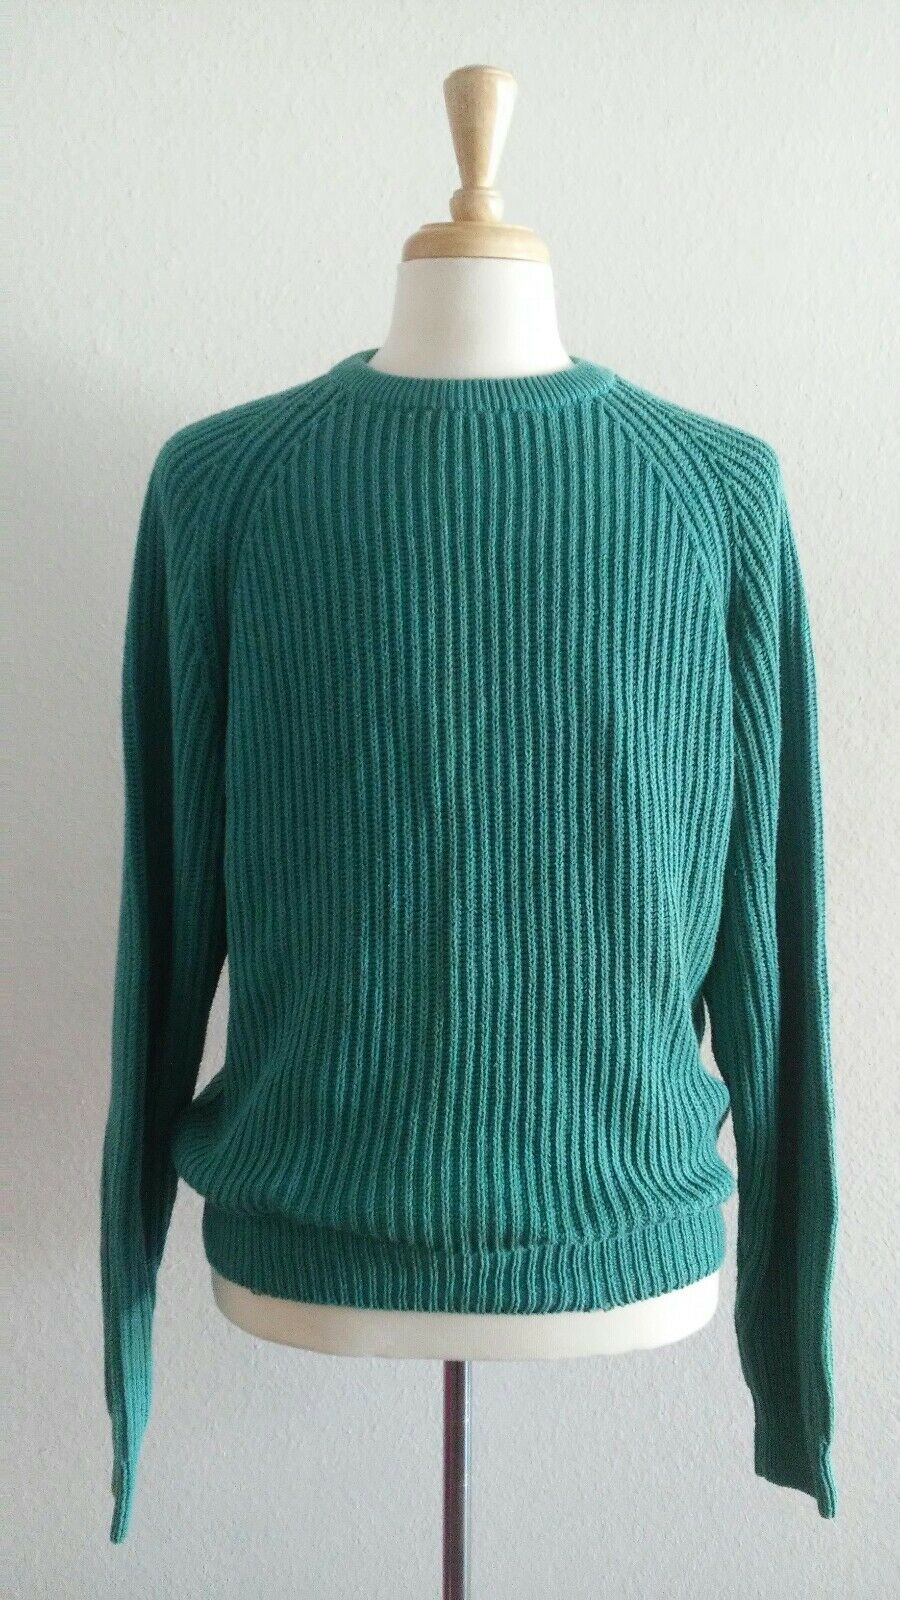 Vintage Highway 101 North Men's bluee Green Knit Sweater Sz L